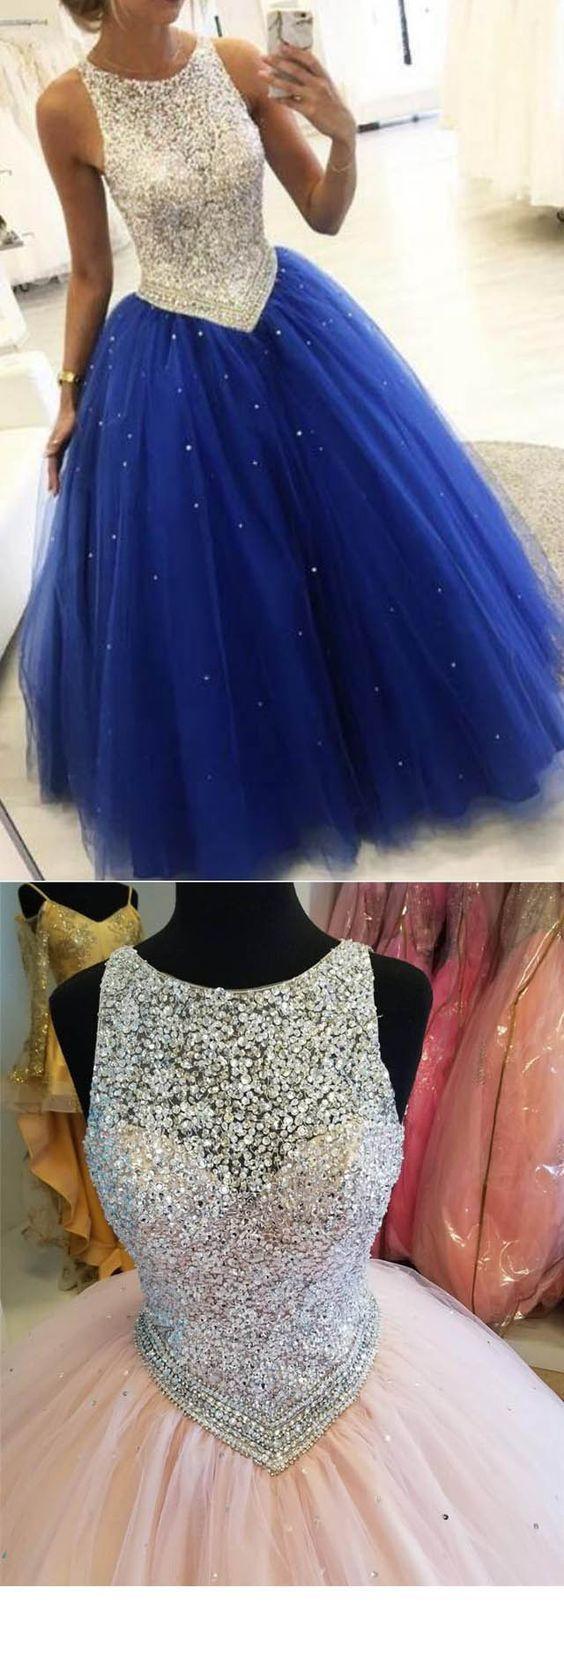 Royal Blue Beaded Ball Gown Girls Sweet 16 Prom Party Dresses P2686 Ball Gowns Prom Cute Prom Dresses Cheap Sweet 16 Dresses [ 1654 x 564 Pixel ]